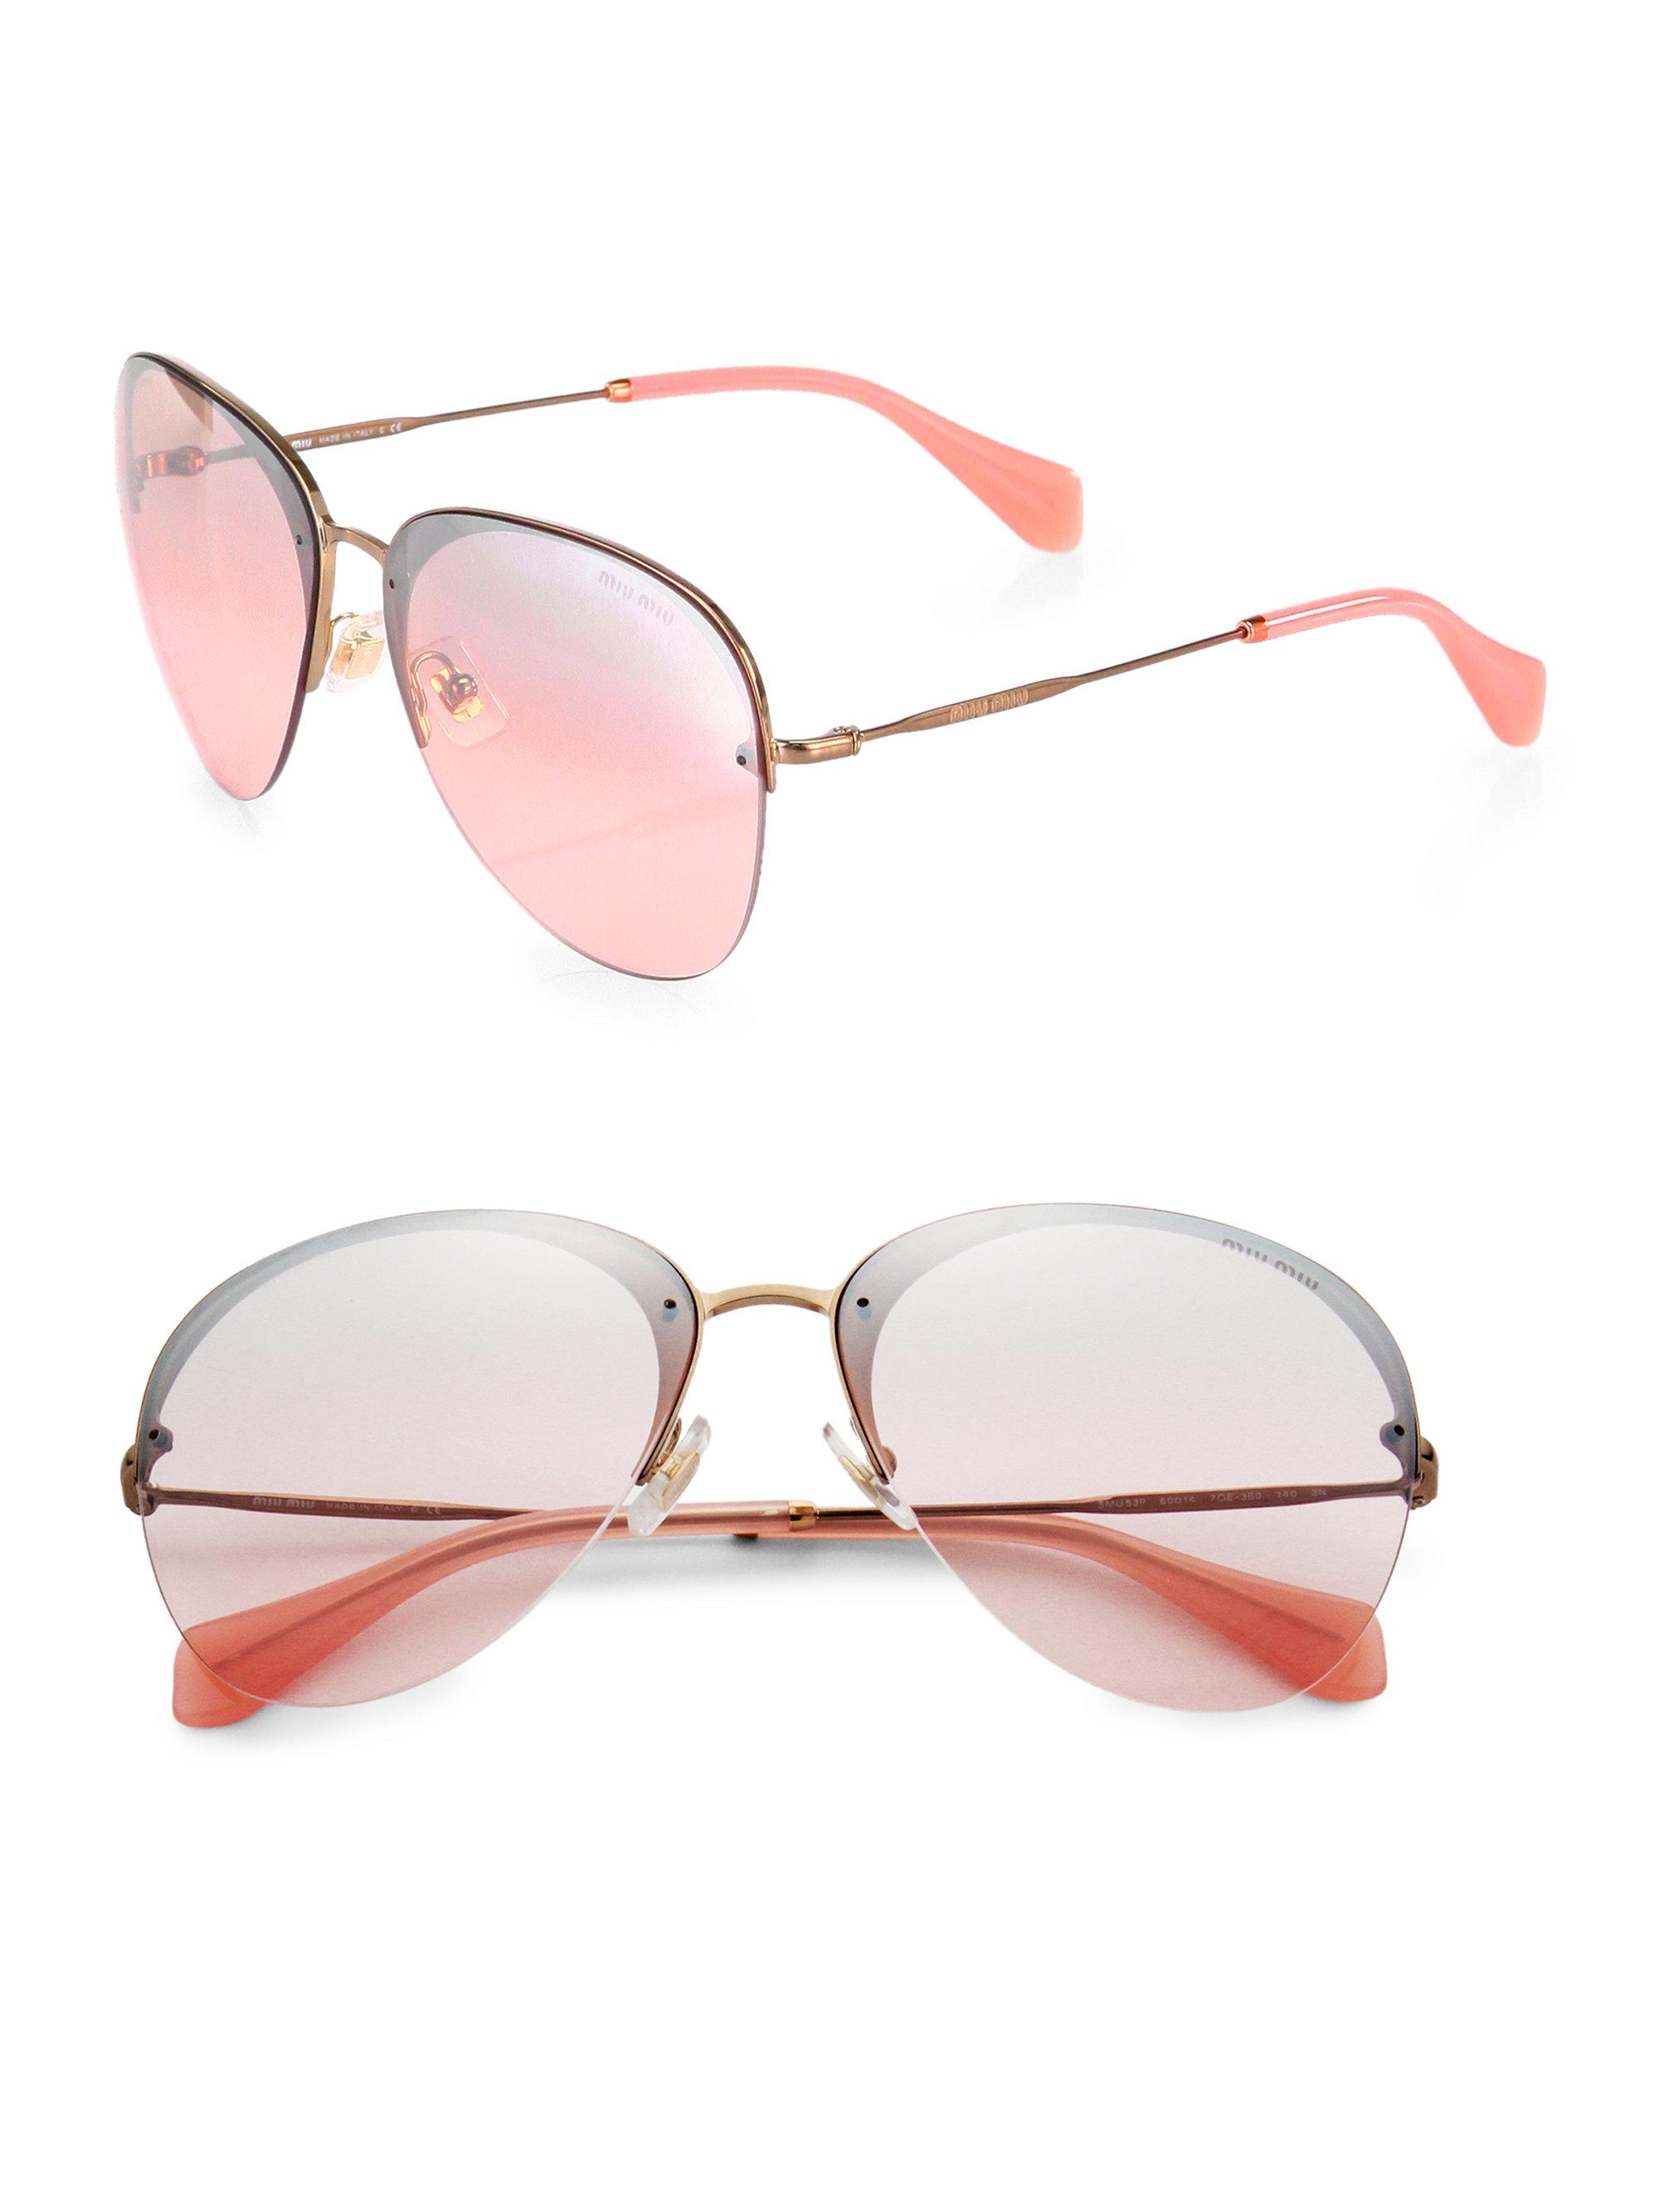 04937ea5d125 Miu Miu Pilot Aviator Sunglasses in Metallic - Lyst